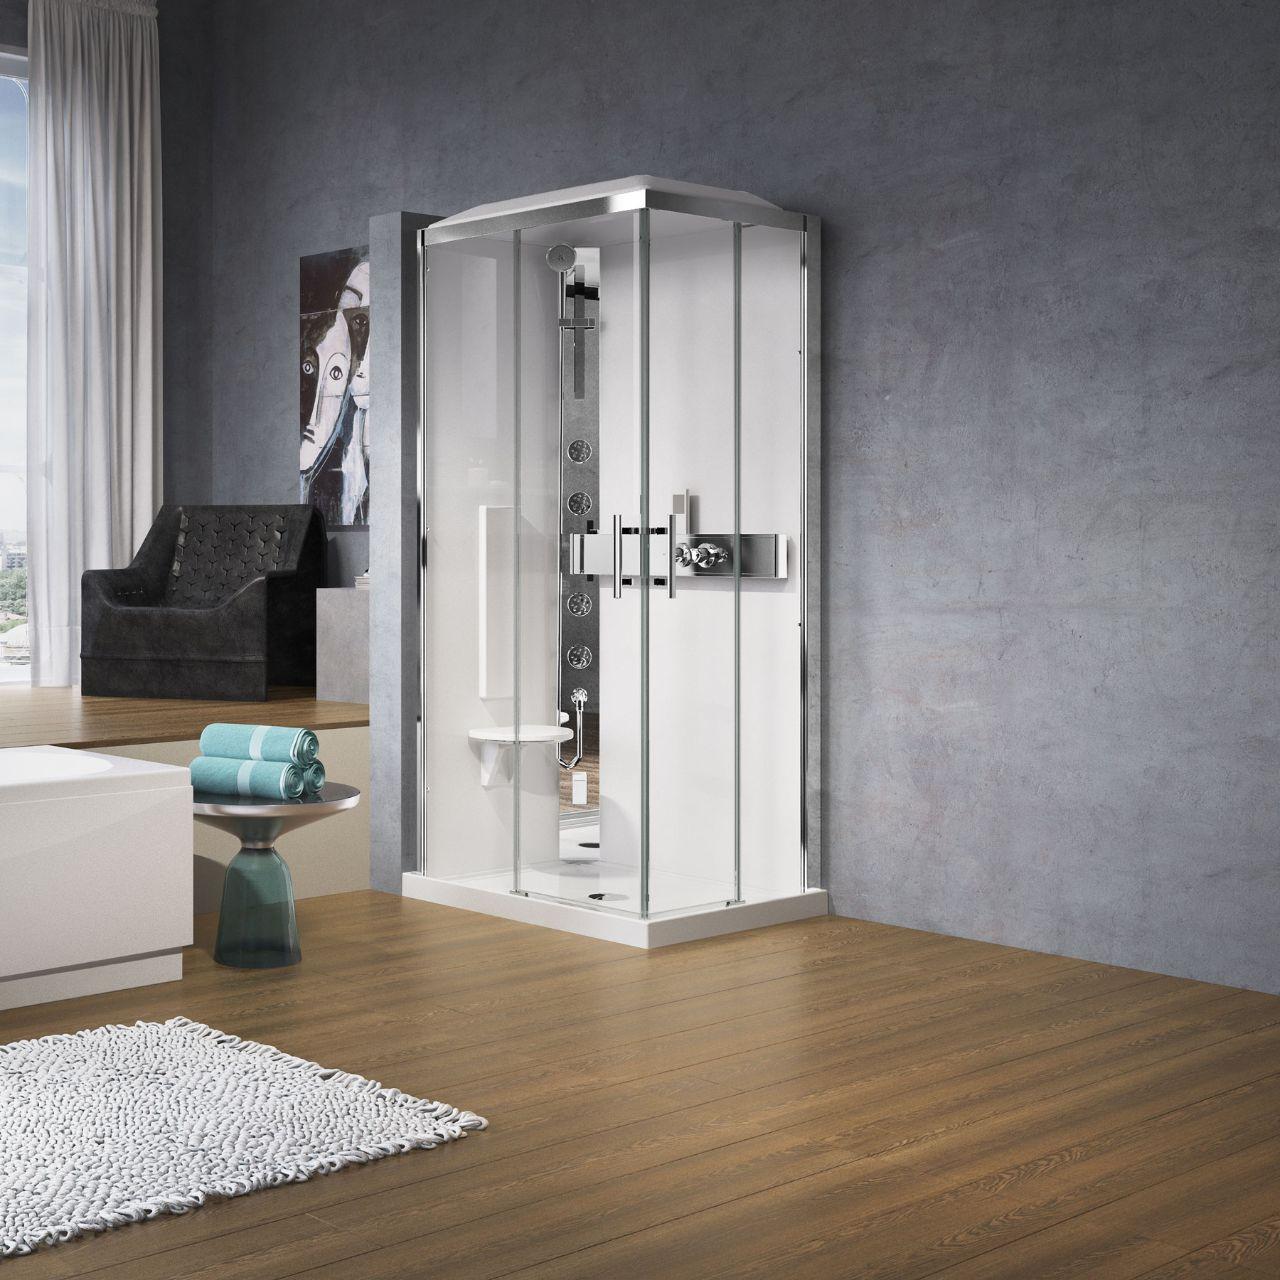 cabines de douche glax a100x80 novellini. Black Bedroom Furniture Sets. Home Design Ideas